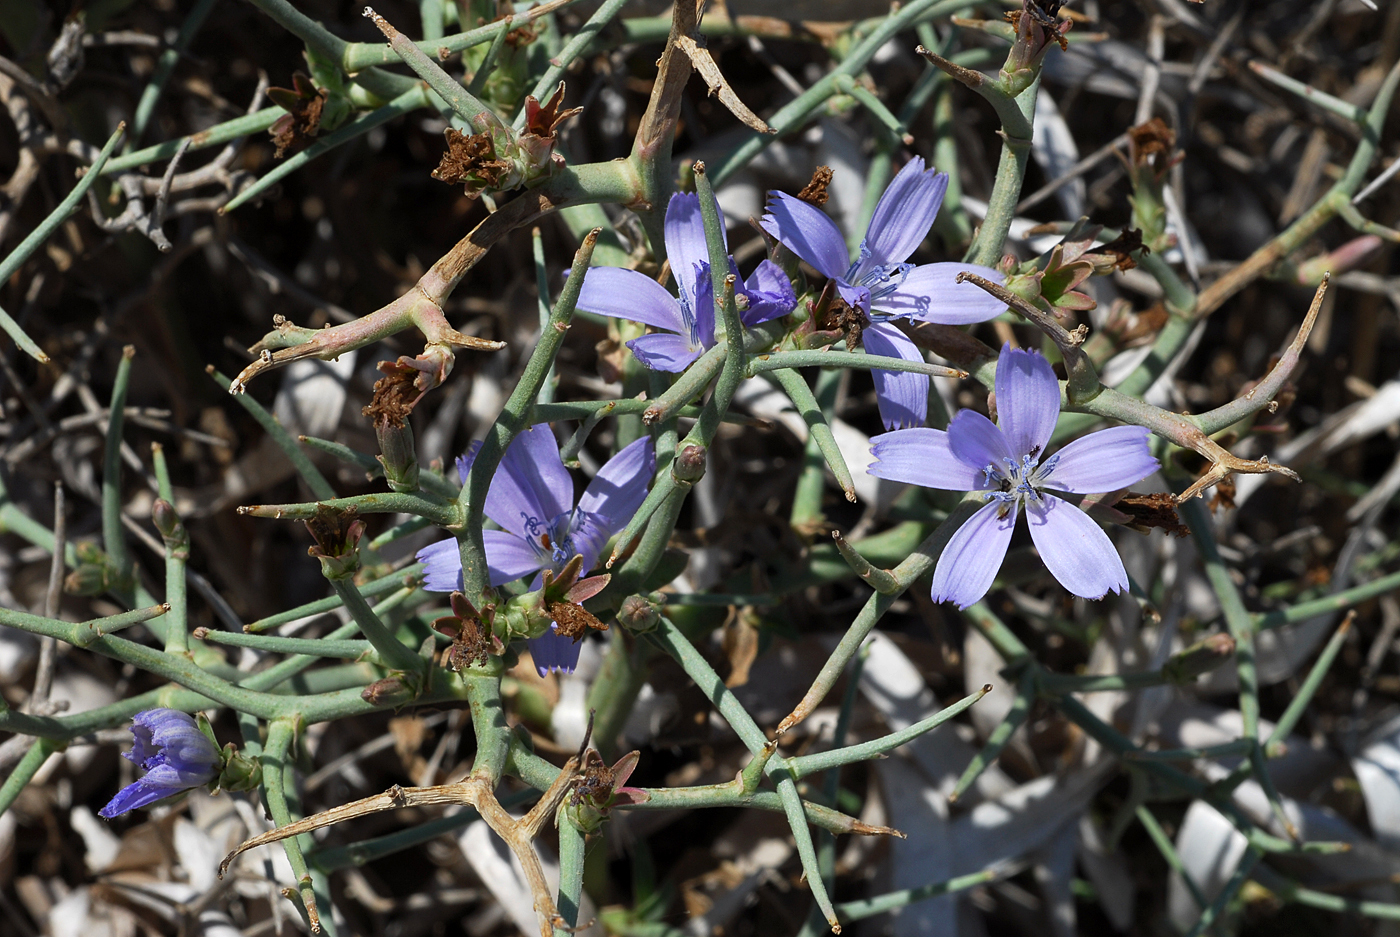 https://pictures.bgbm.org/digilib/Scaler?fn=Cyprus/Cichorium_spinosum_B2.jpg&mo=file